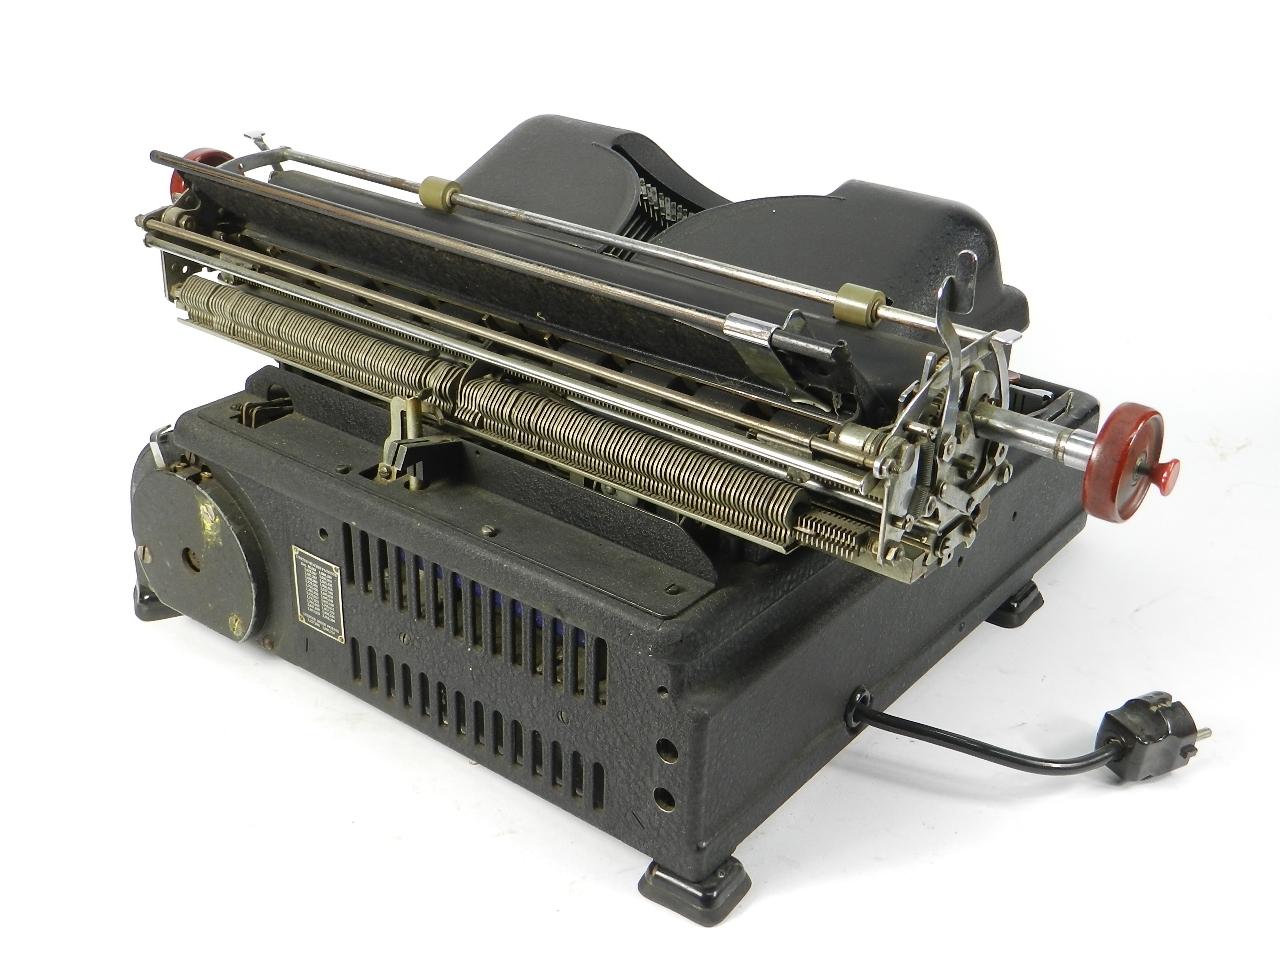 Imagen IBM ELECTROMATIC AÑO 1935 40300